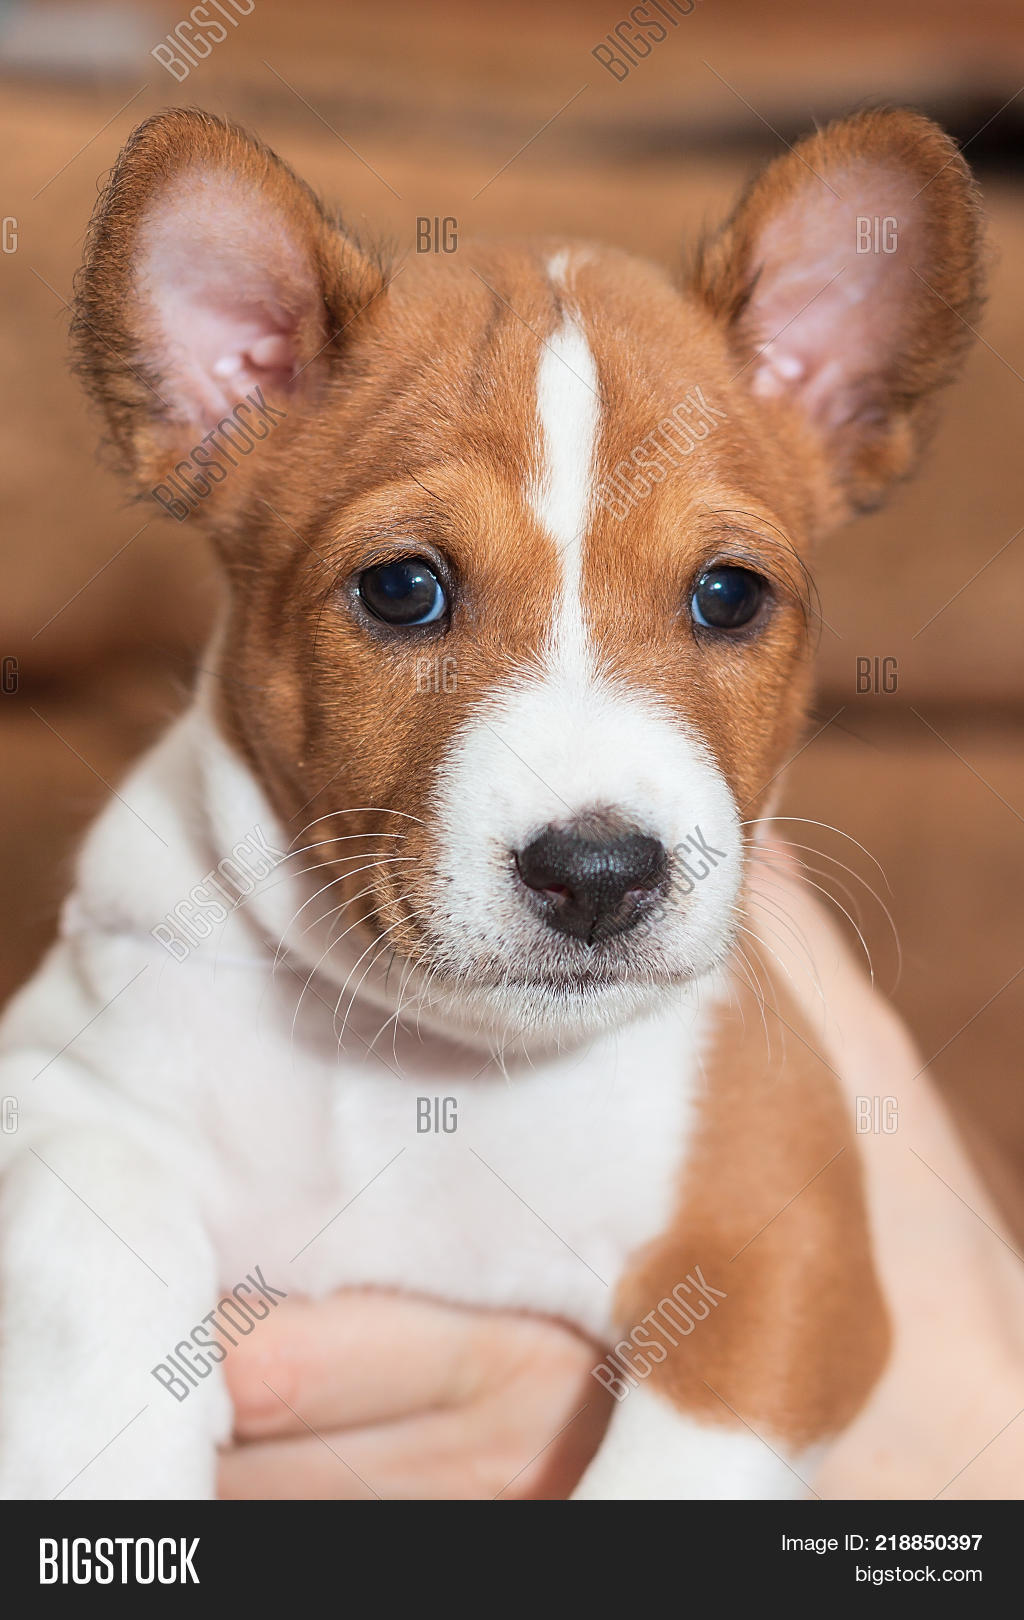 Beautiful Cute Puppy Image Photo Free Trial Bigstock